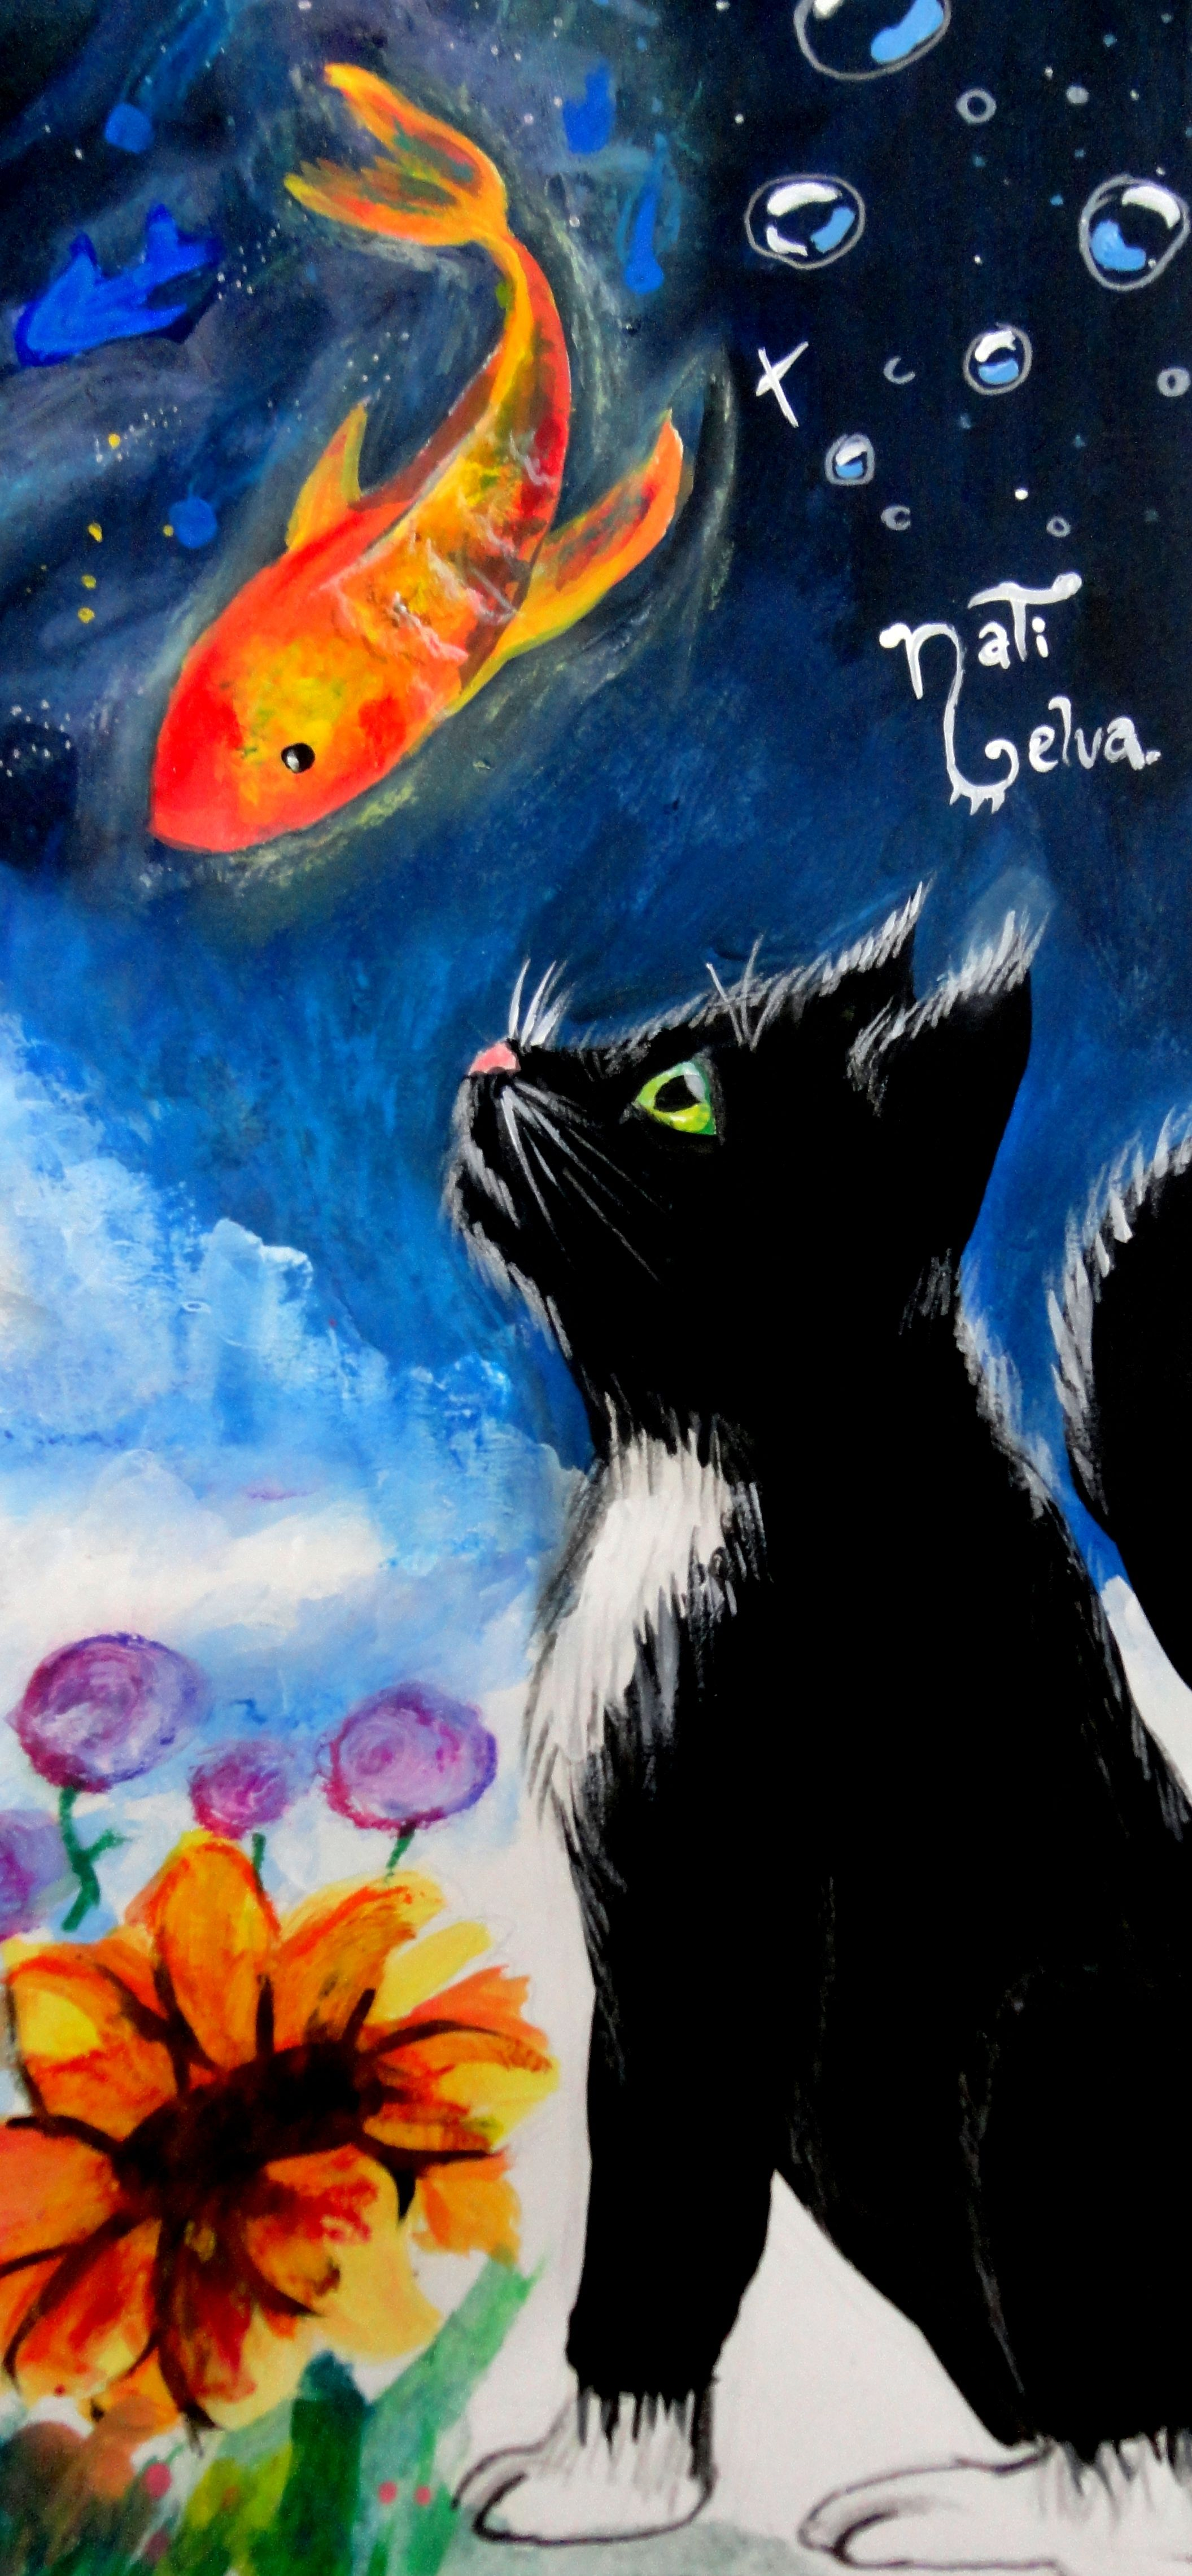 pescado, #gato, #dibujo, #colores, #planeta, #luna, #flores, #cielo ...